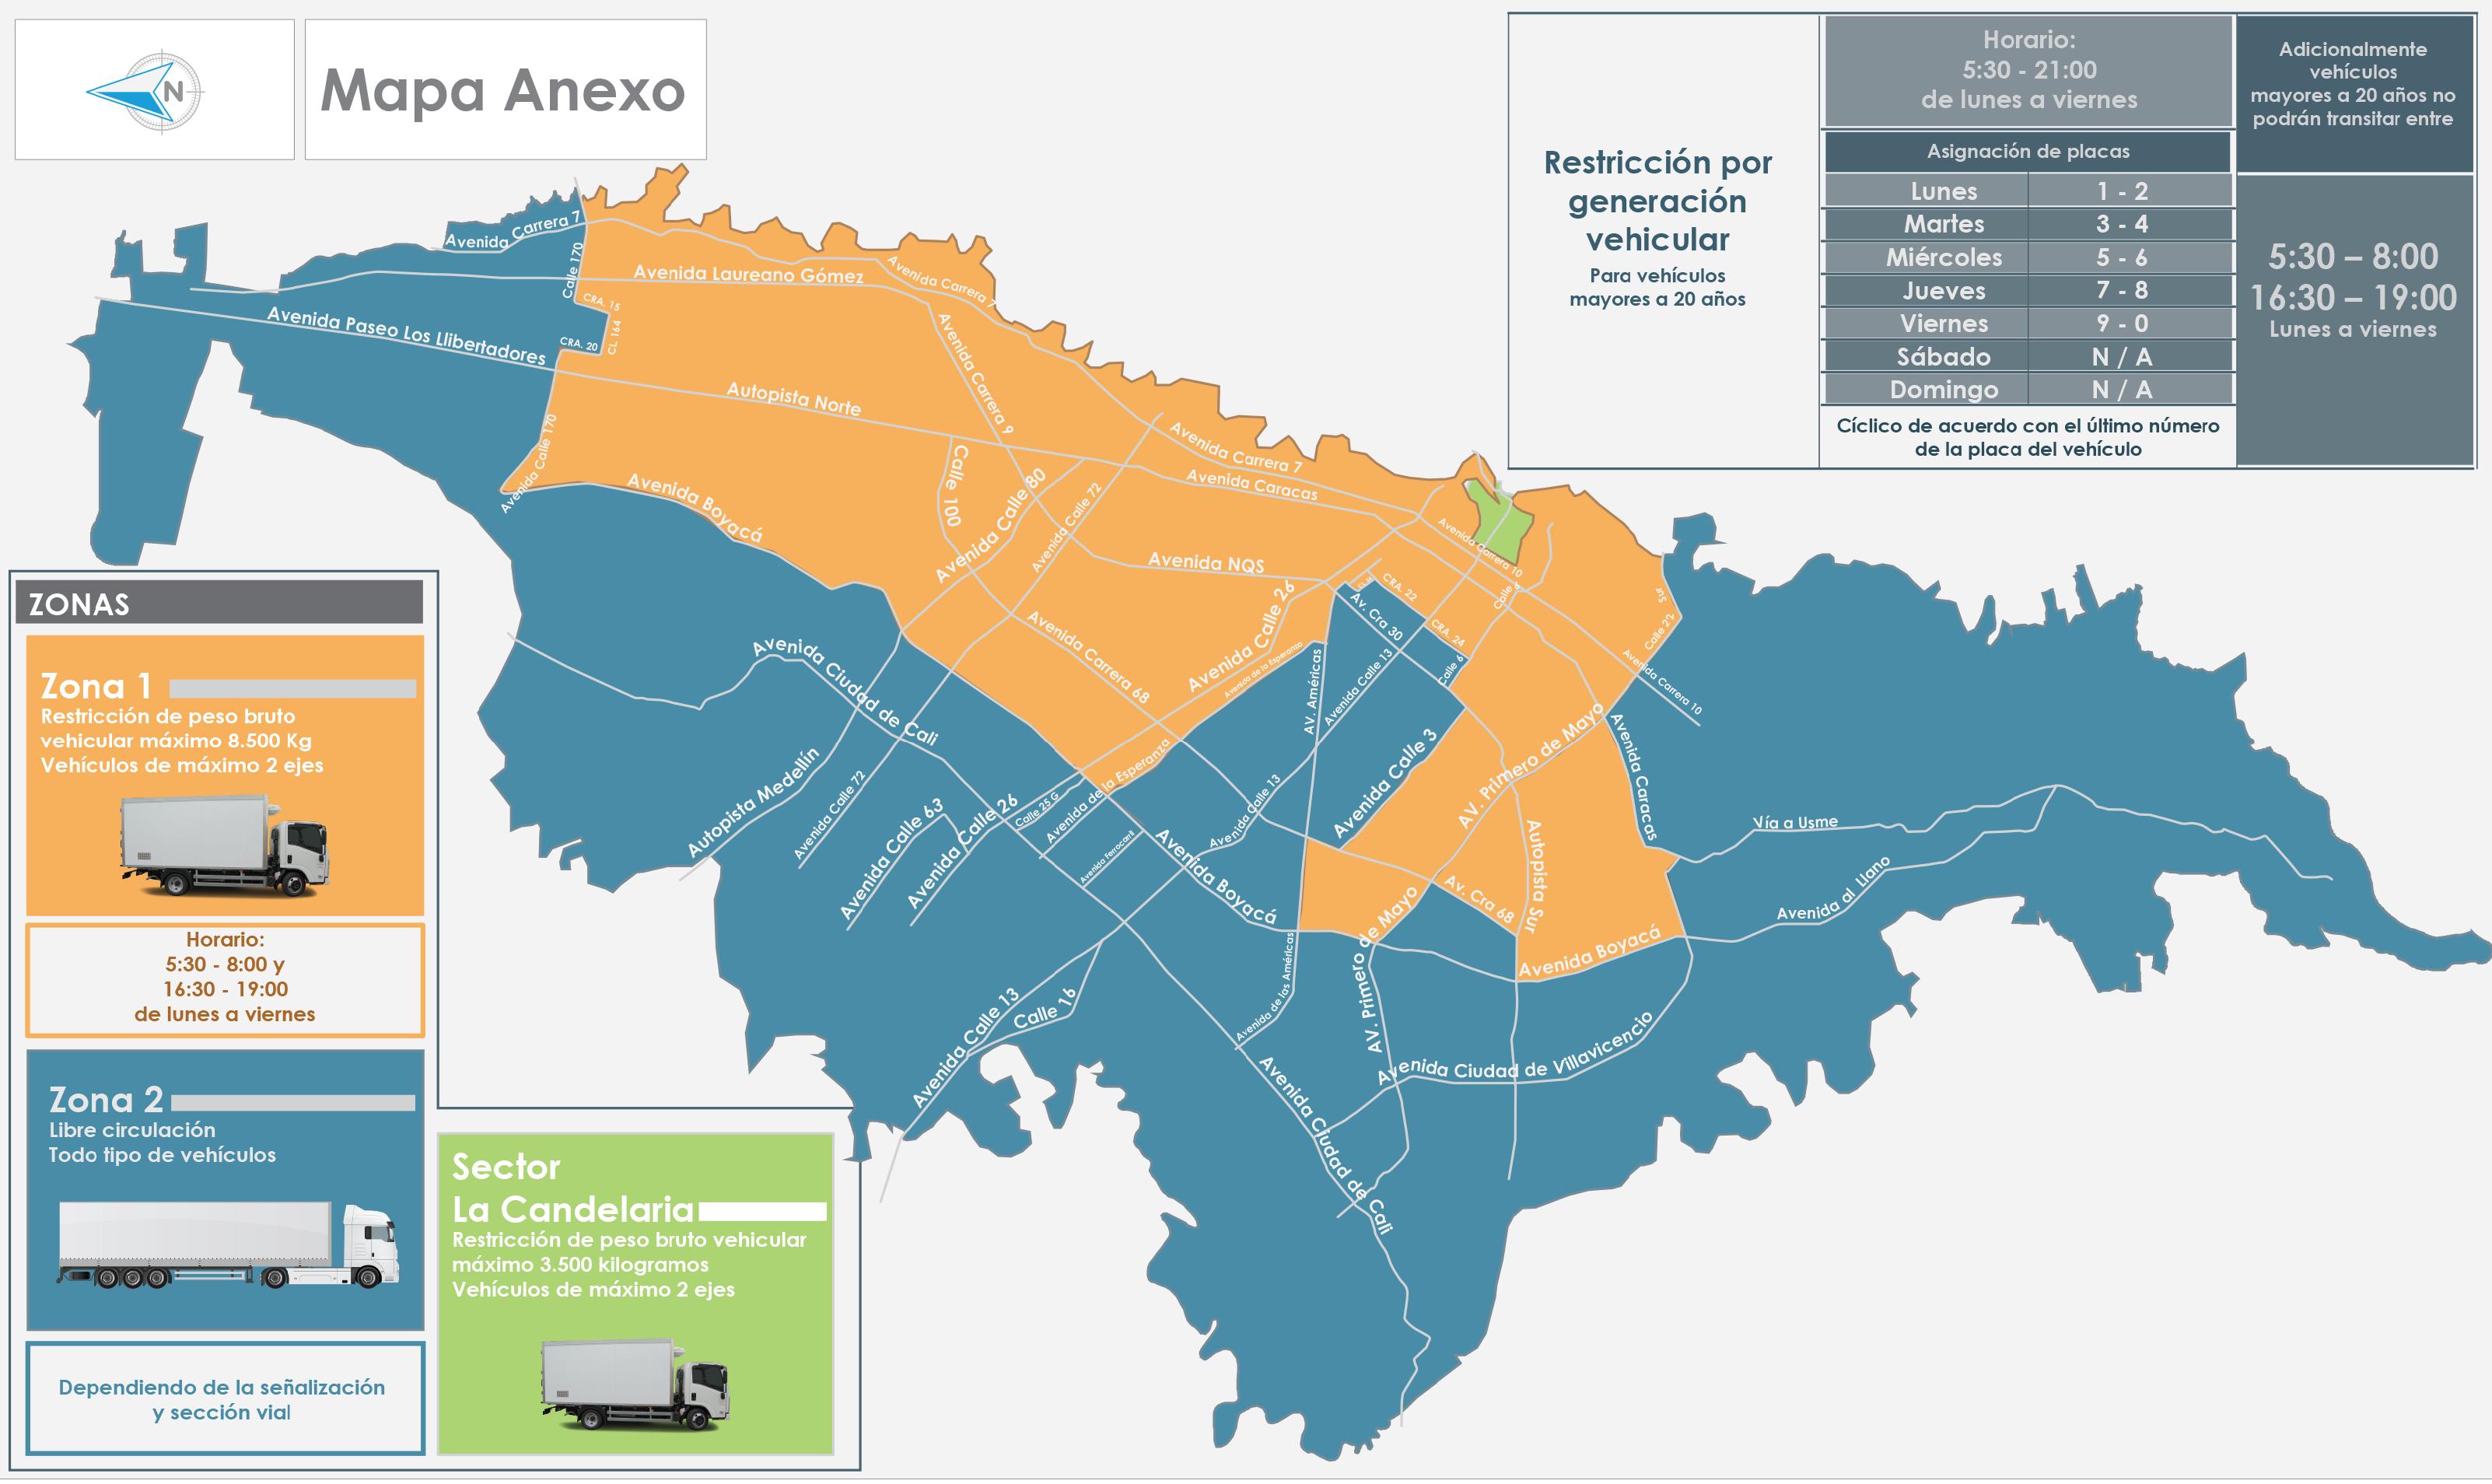 mapa_restriccion_de_carga_por_zonas